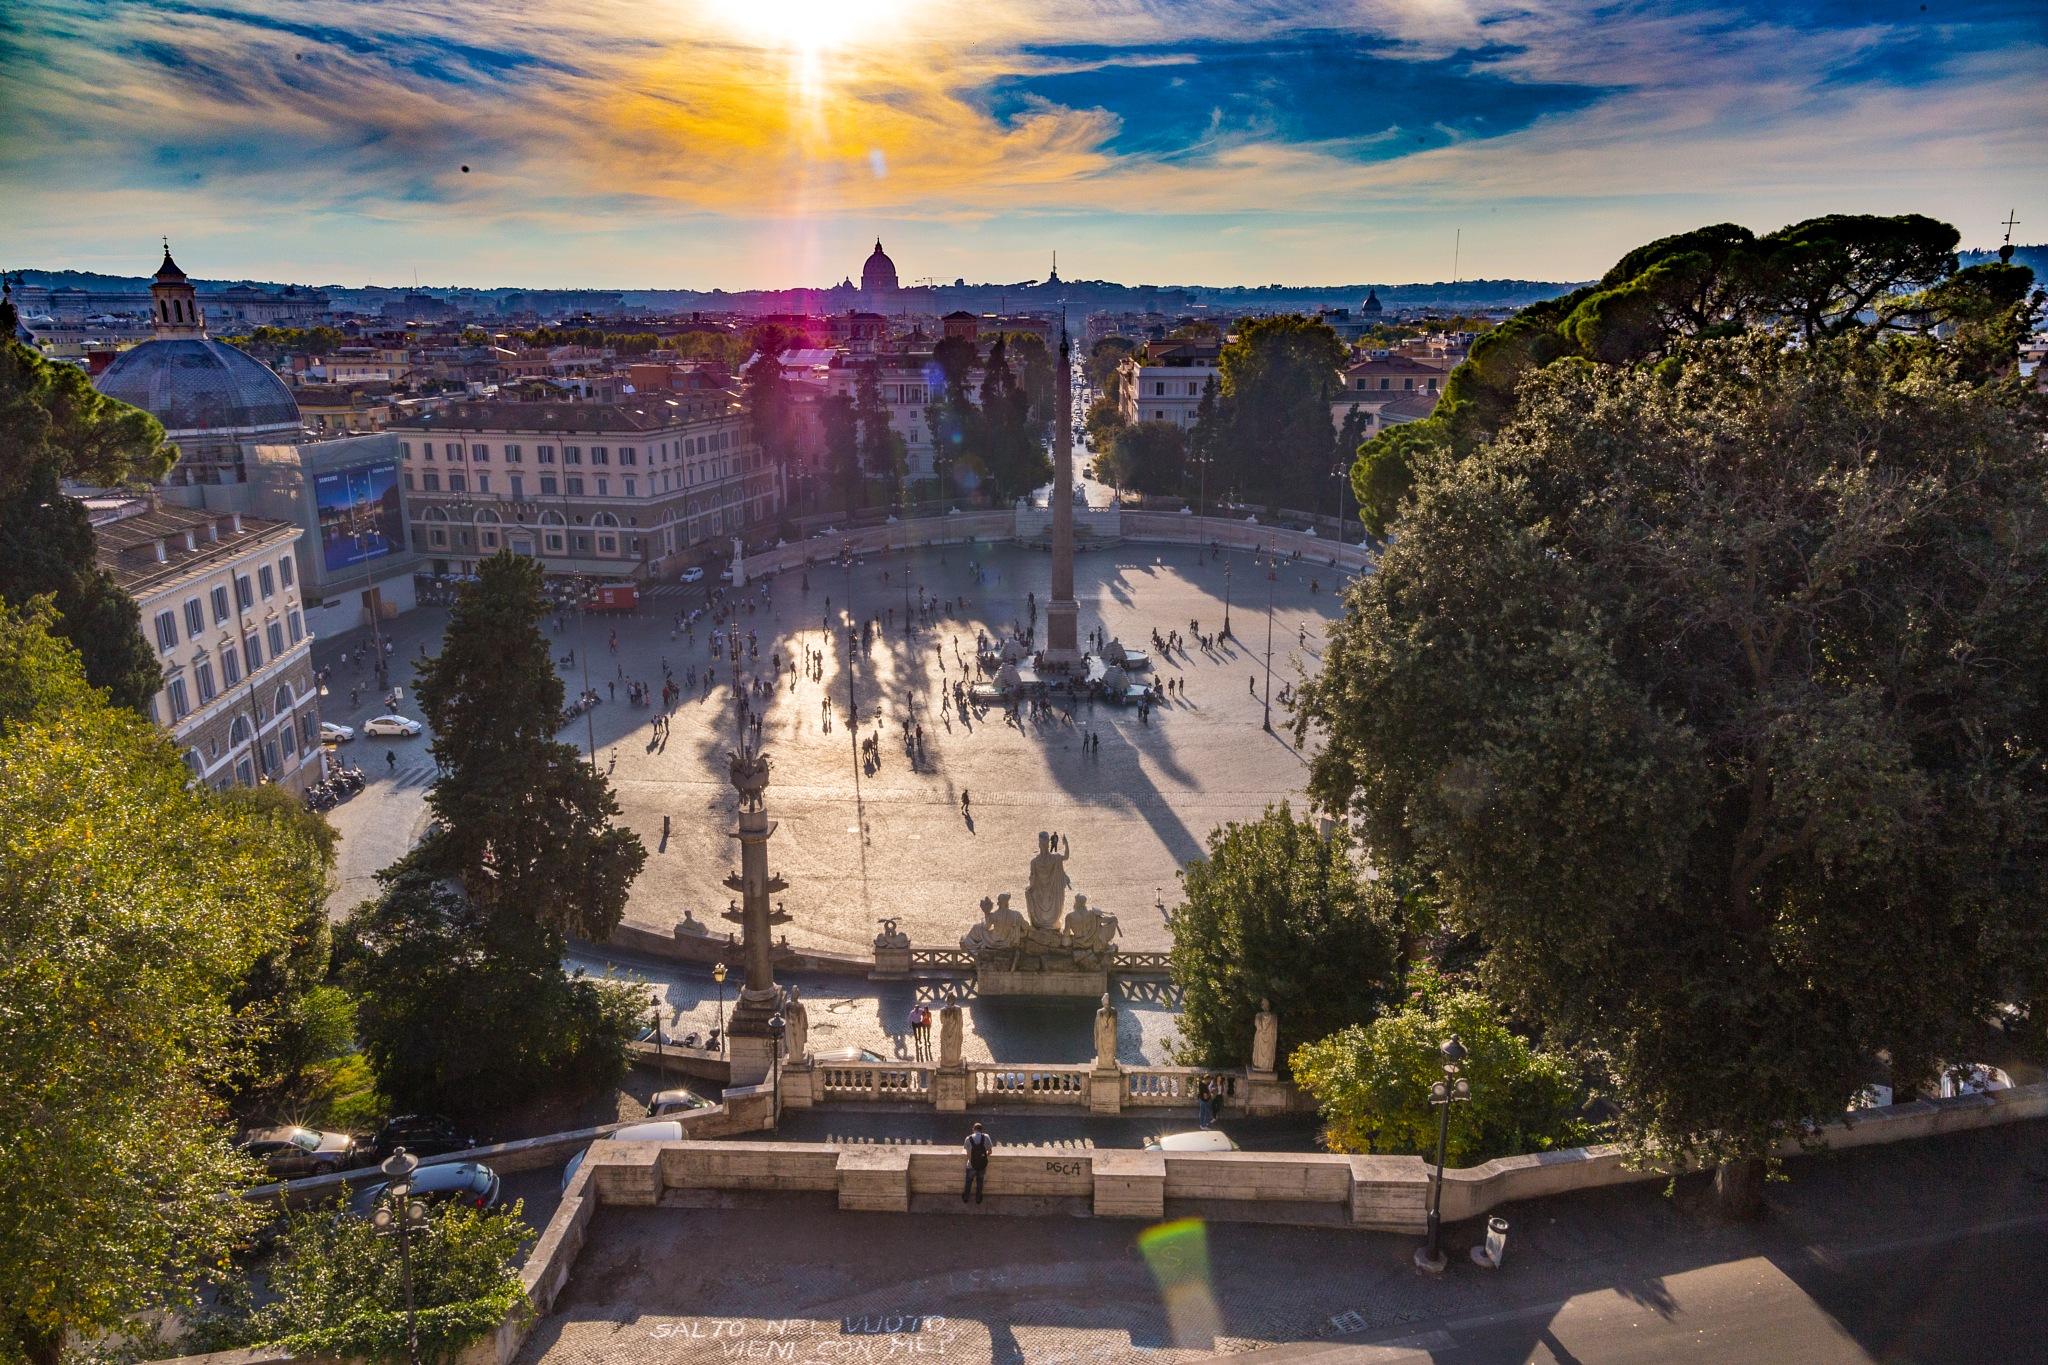 A View from Villa Borghese, Rome by carljan w carlsson